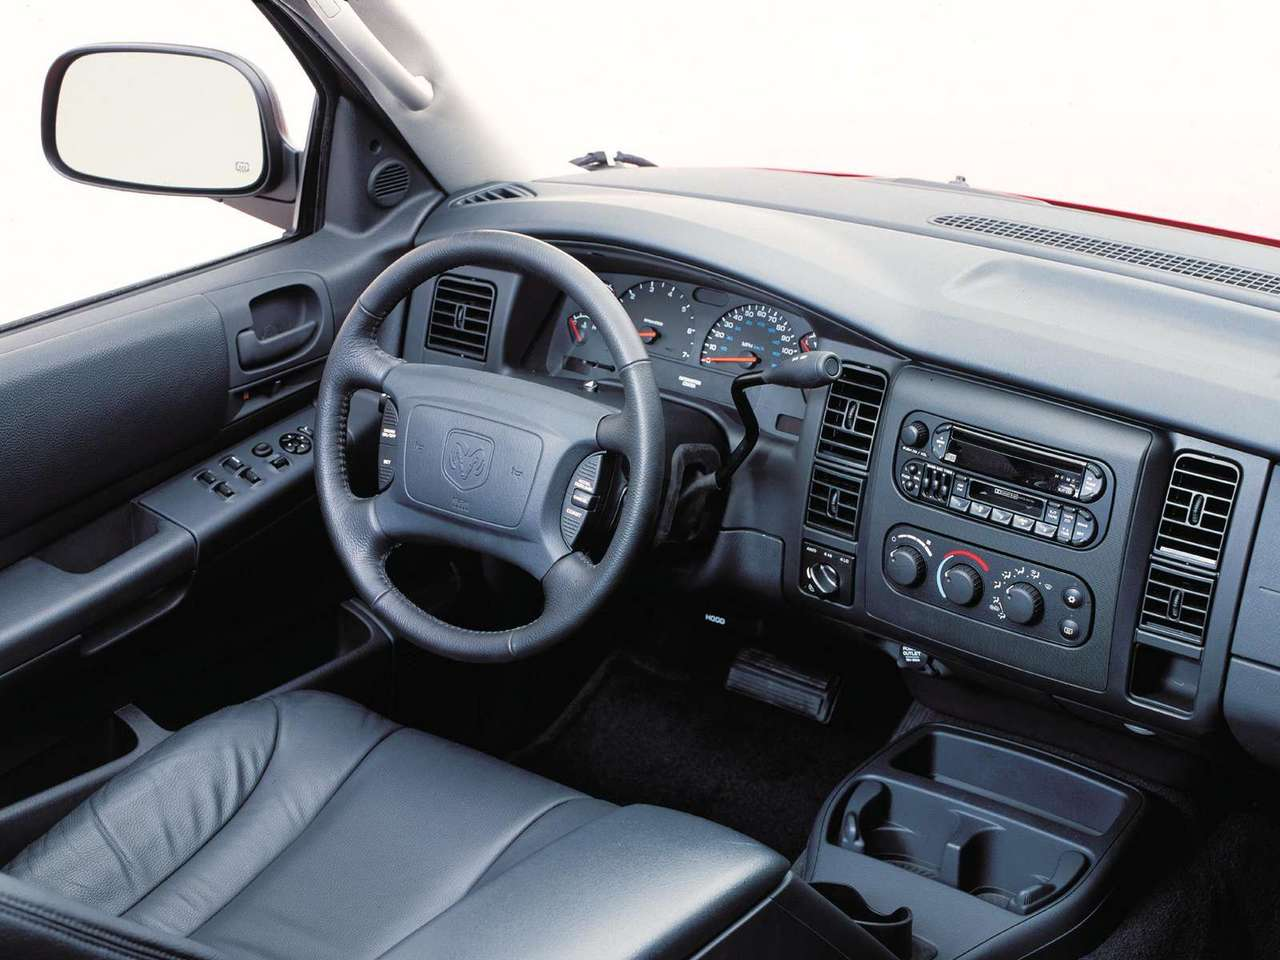 Dodge Dakota X Wallpaper on 2000 Dodge Dakota Lifted